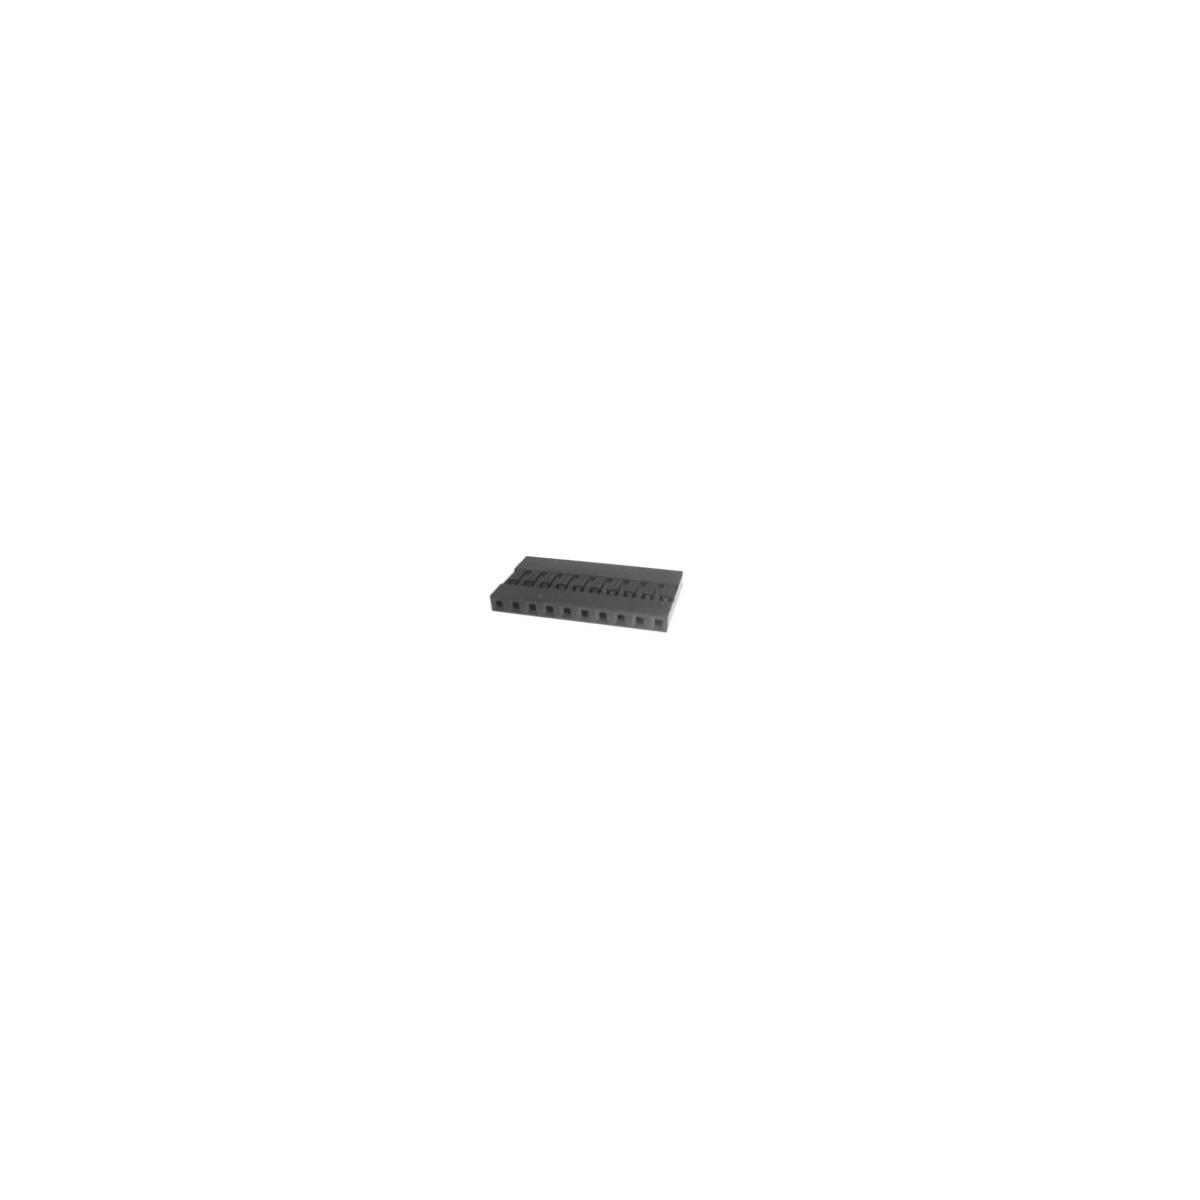 MODU MLS-10 1X10 VIAS - 2,54MM/180 - METALTEX-